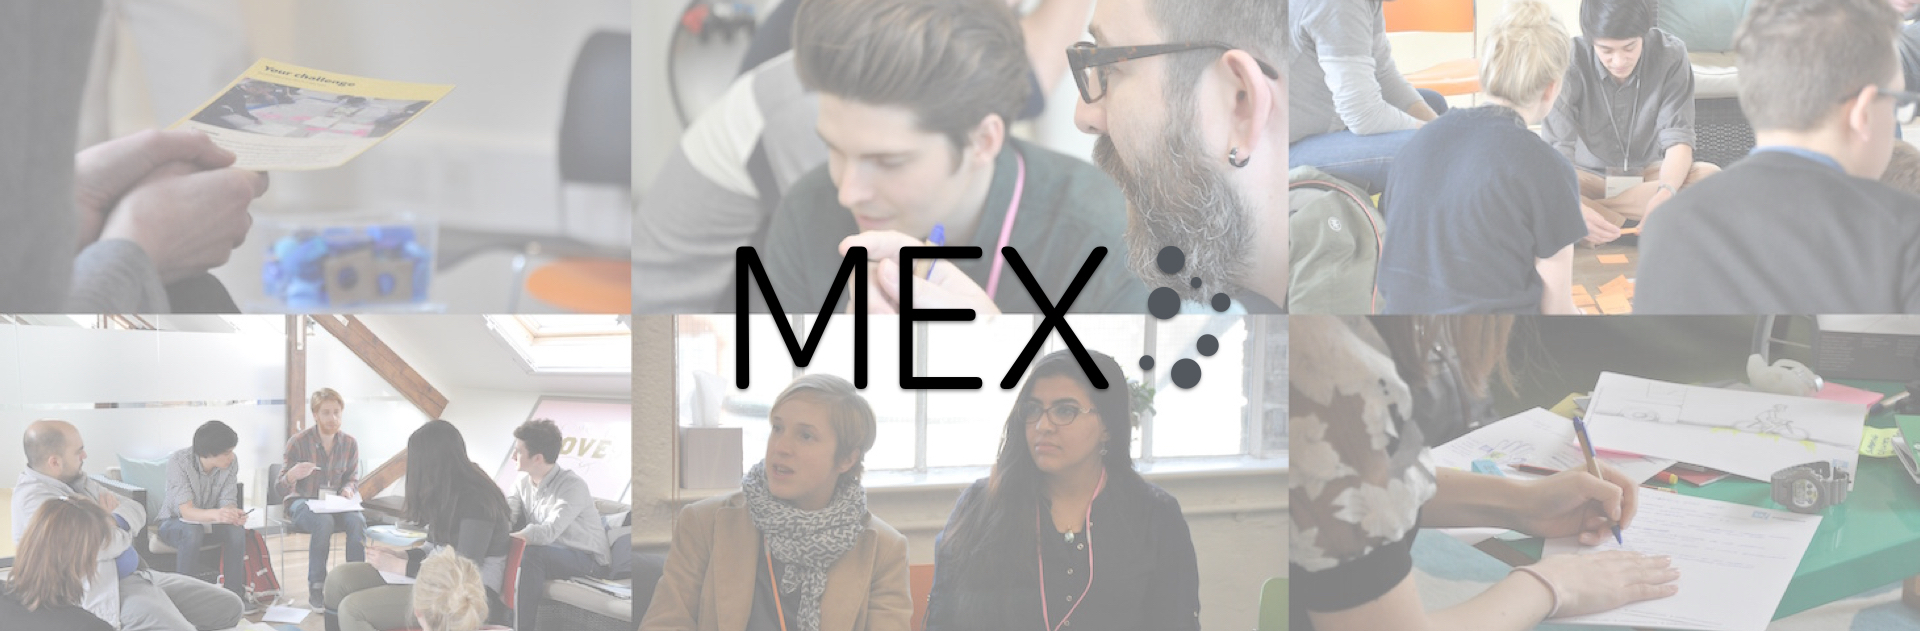 MEX community patrons